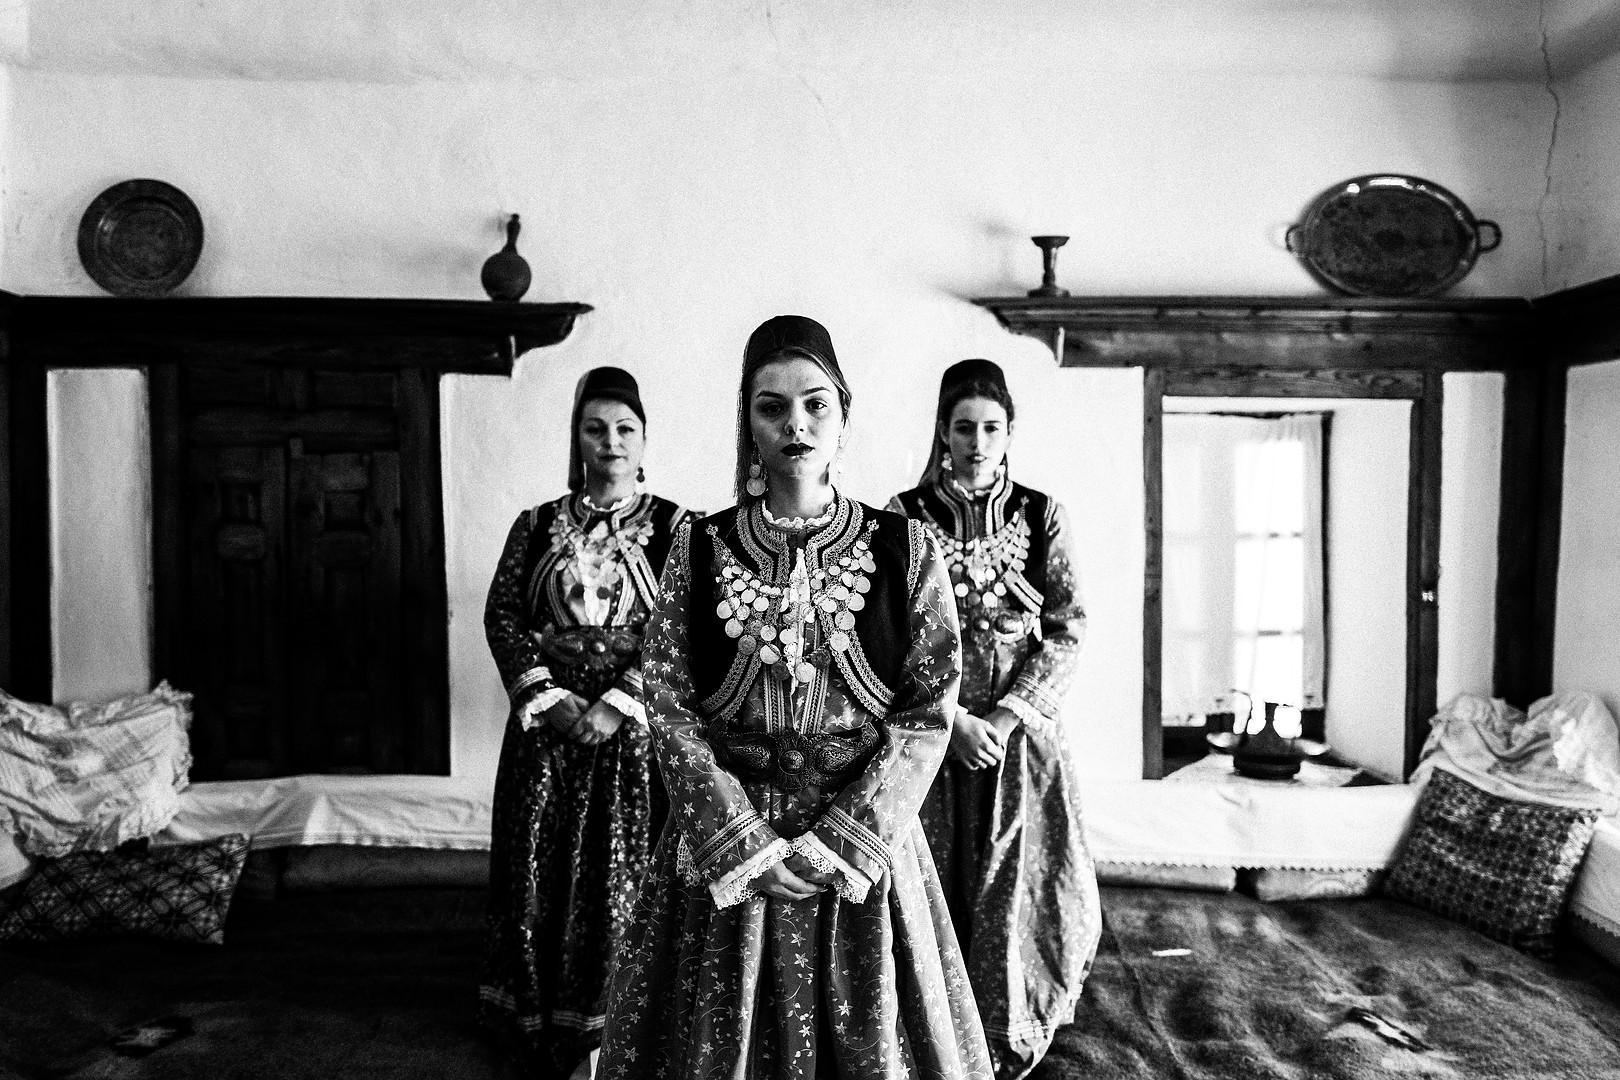 Costume of Kastoria, W. Macedonia, Greece